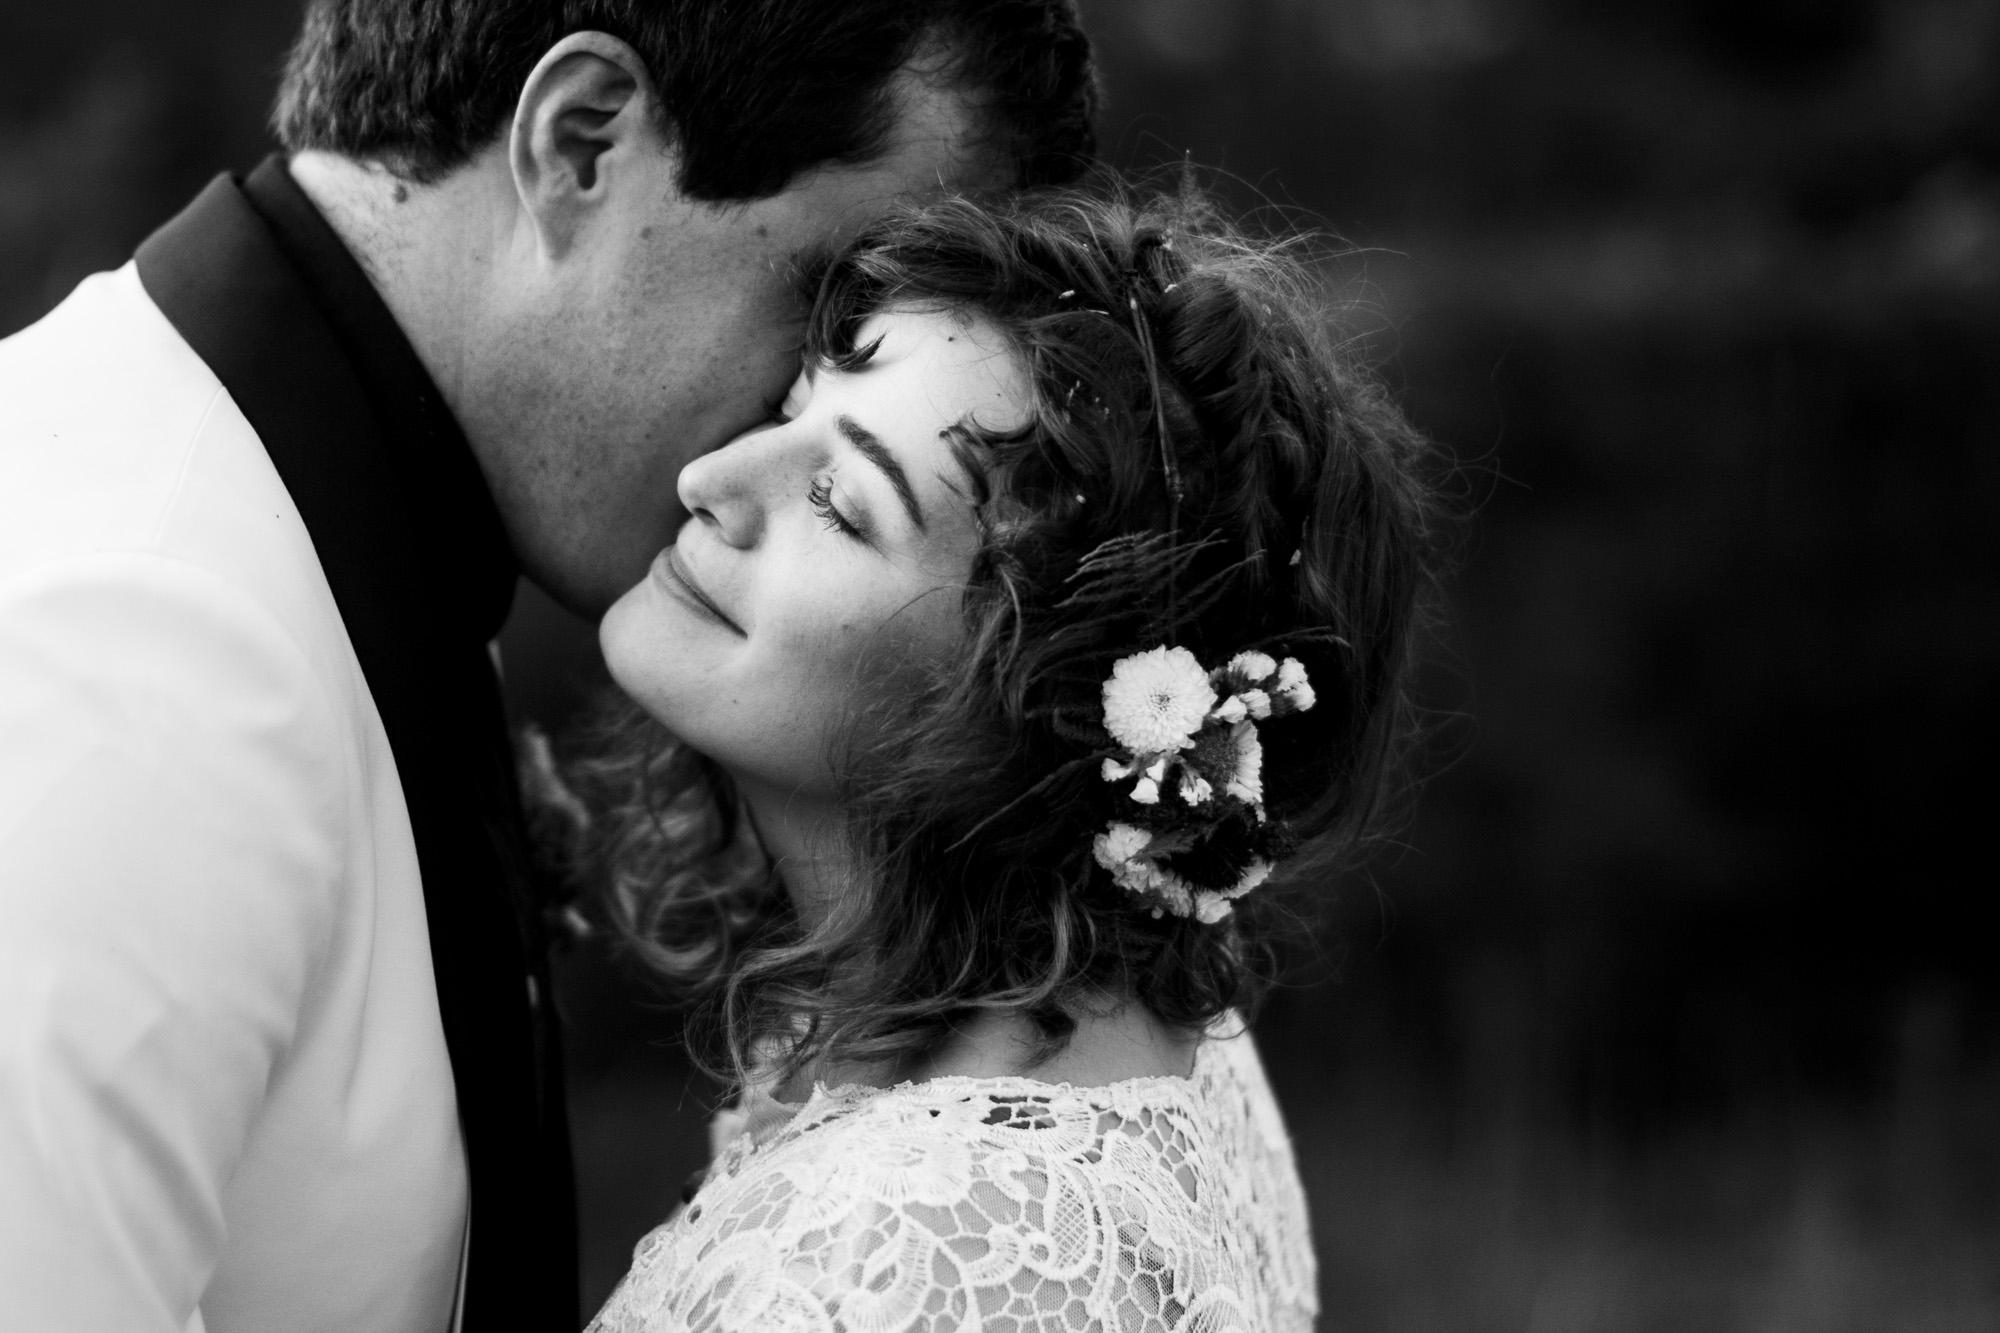 Seriously_Sabrina_Photography_Red_River_Gorge_Kentucky_Wedding_ShawnDana159.jpg